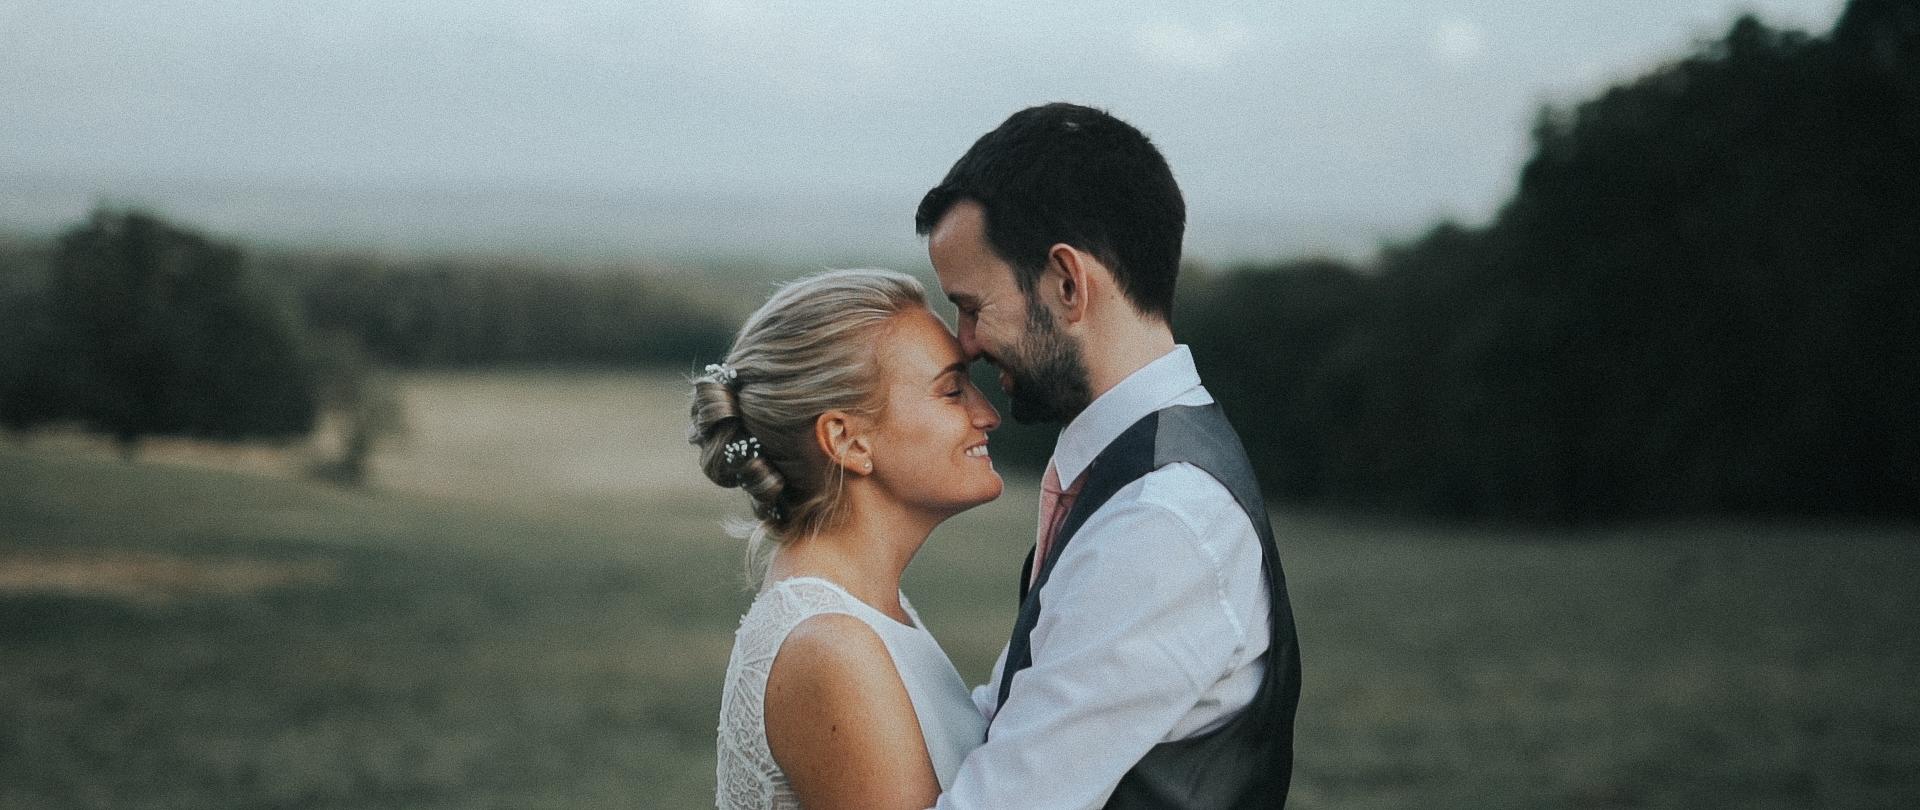 Riverhill Gardens Wedding - Philip Smith Visuals